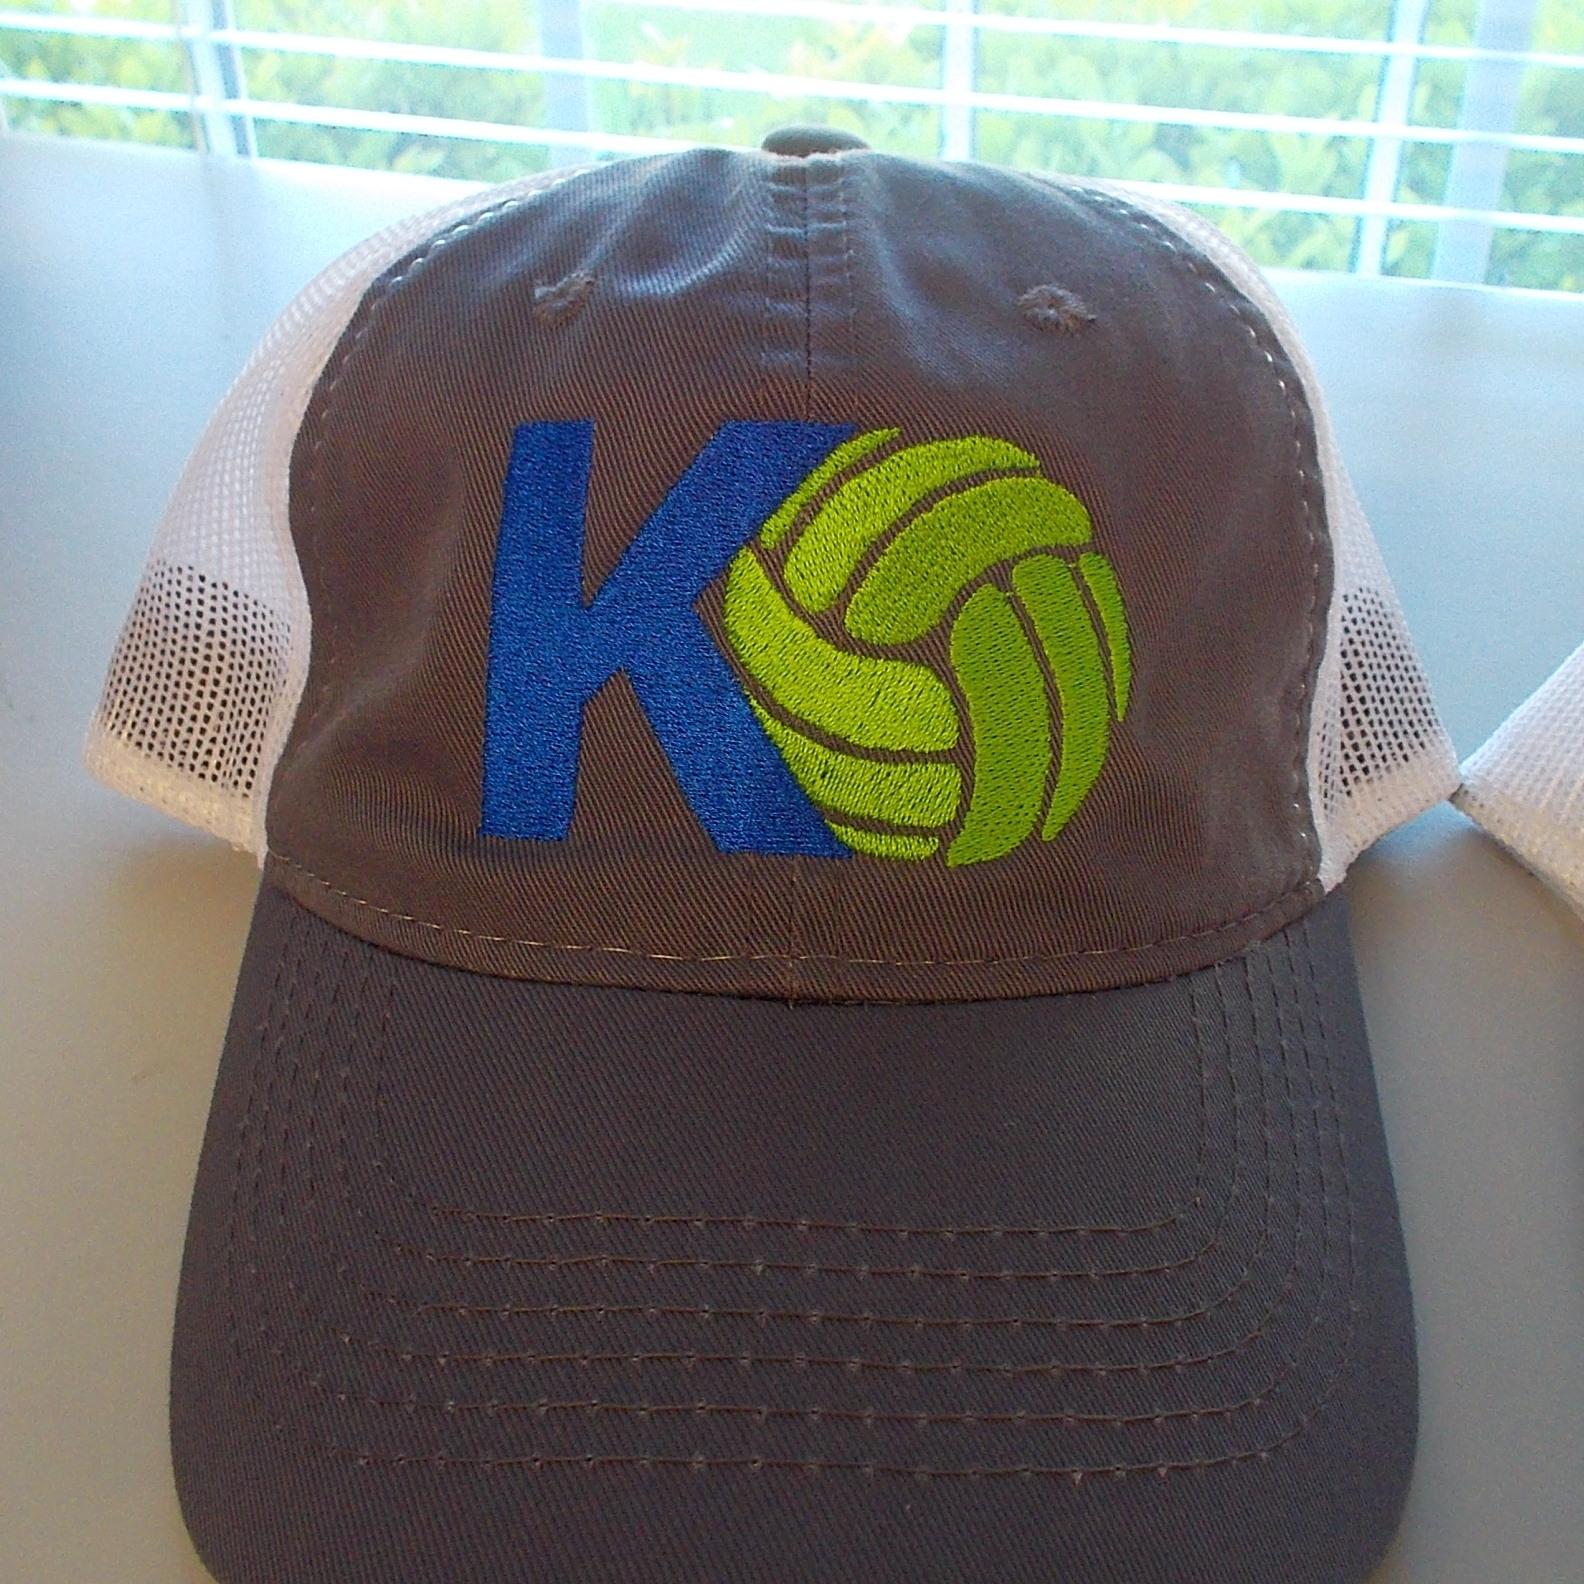 KO Hat - Premium, Low profile mesh back hat.Grey and white - $20